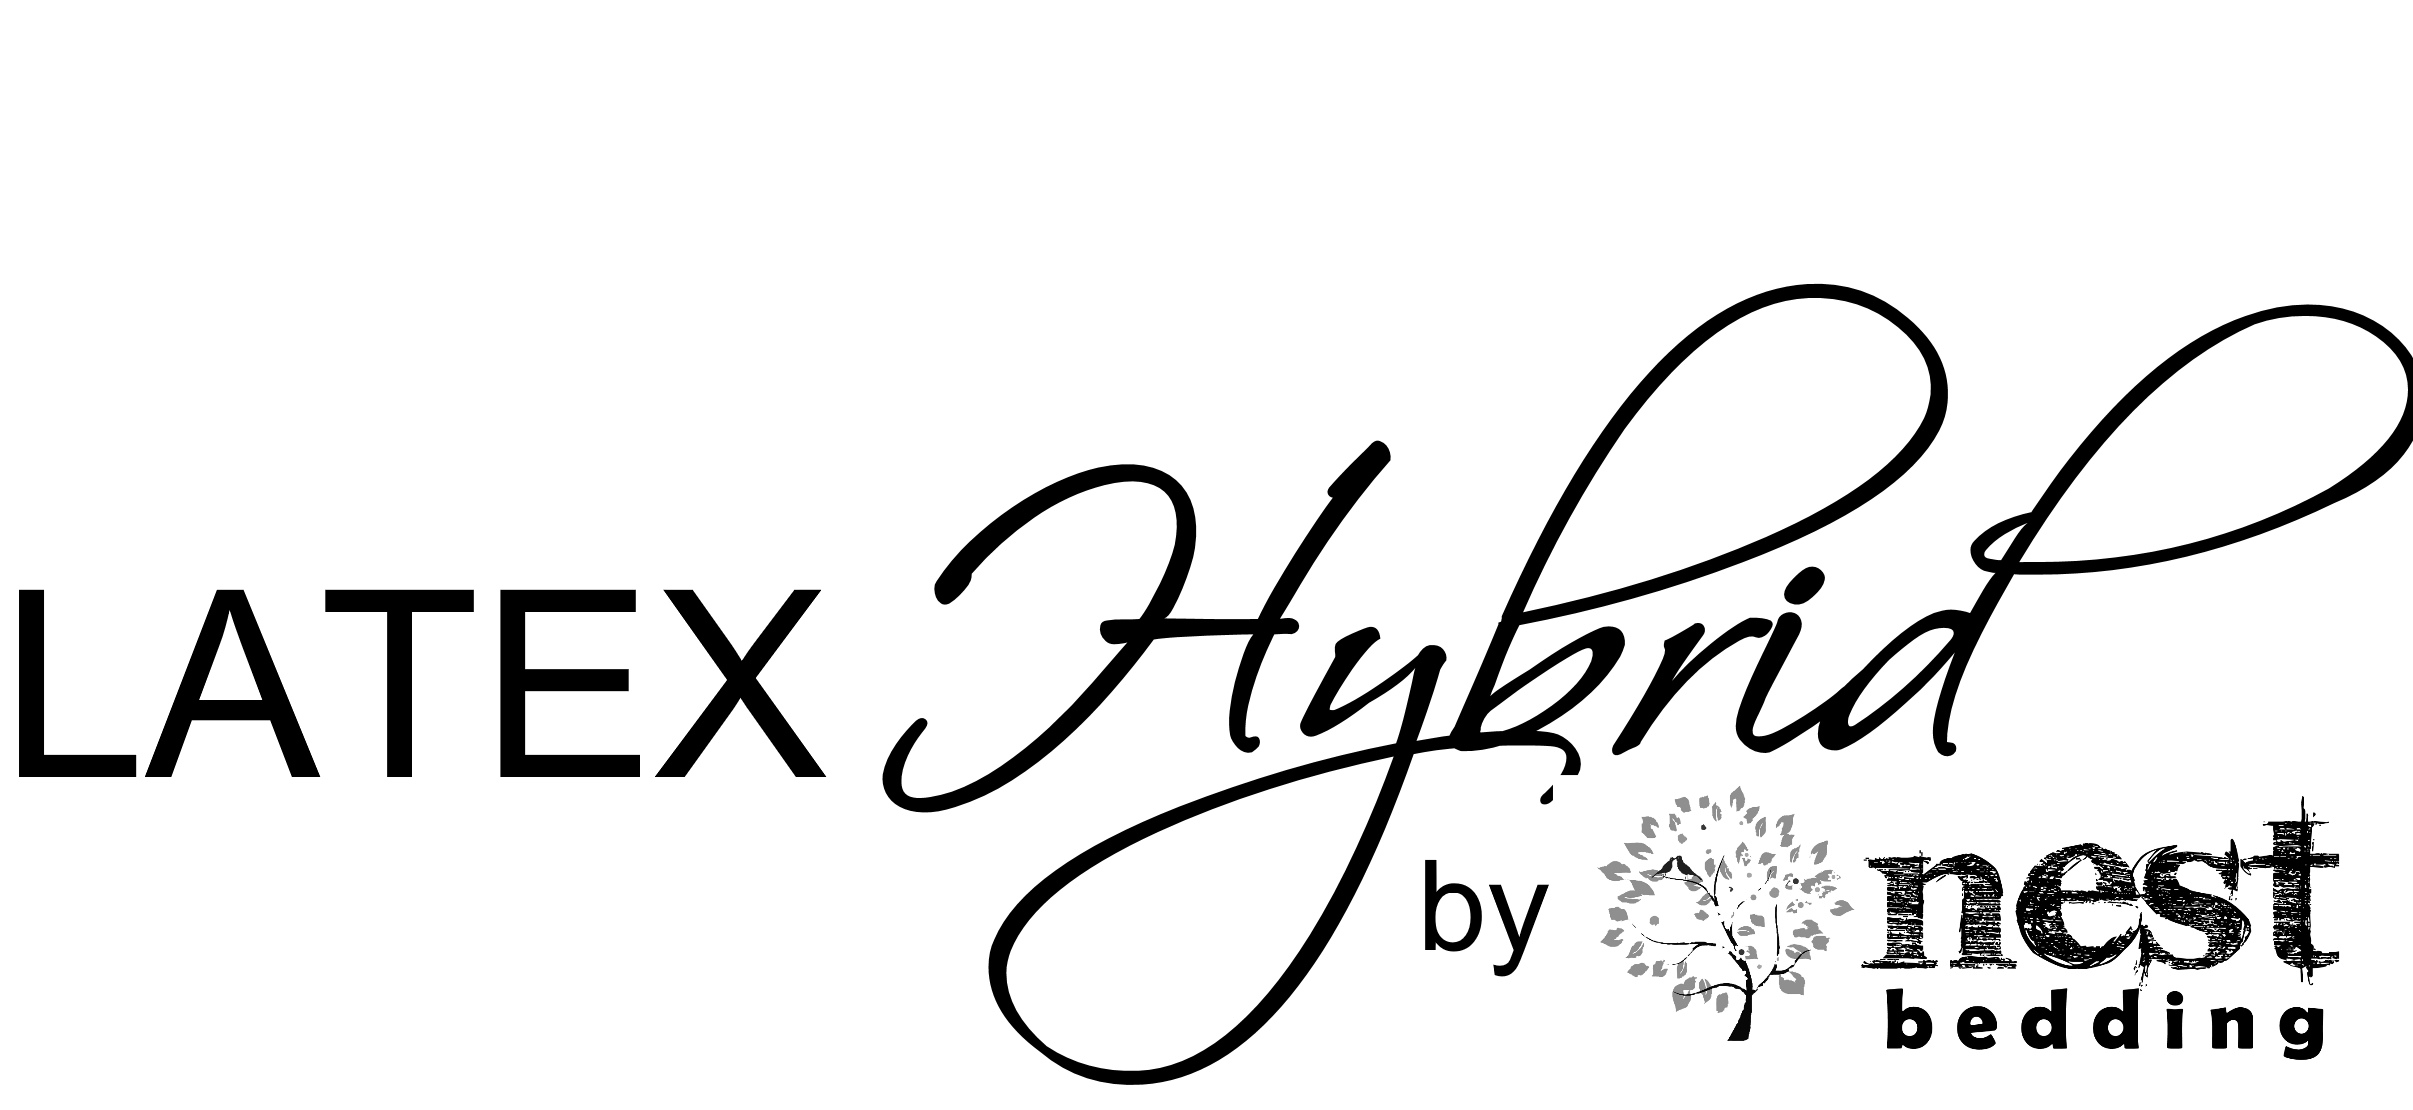 NEST BEDDING Hybrid LATEX Mattress Review - Girl on the Mattress